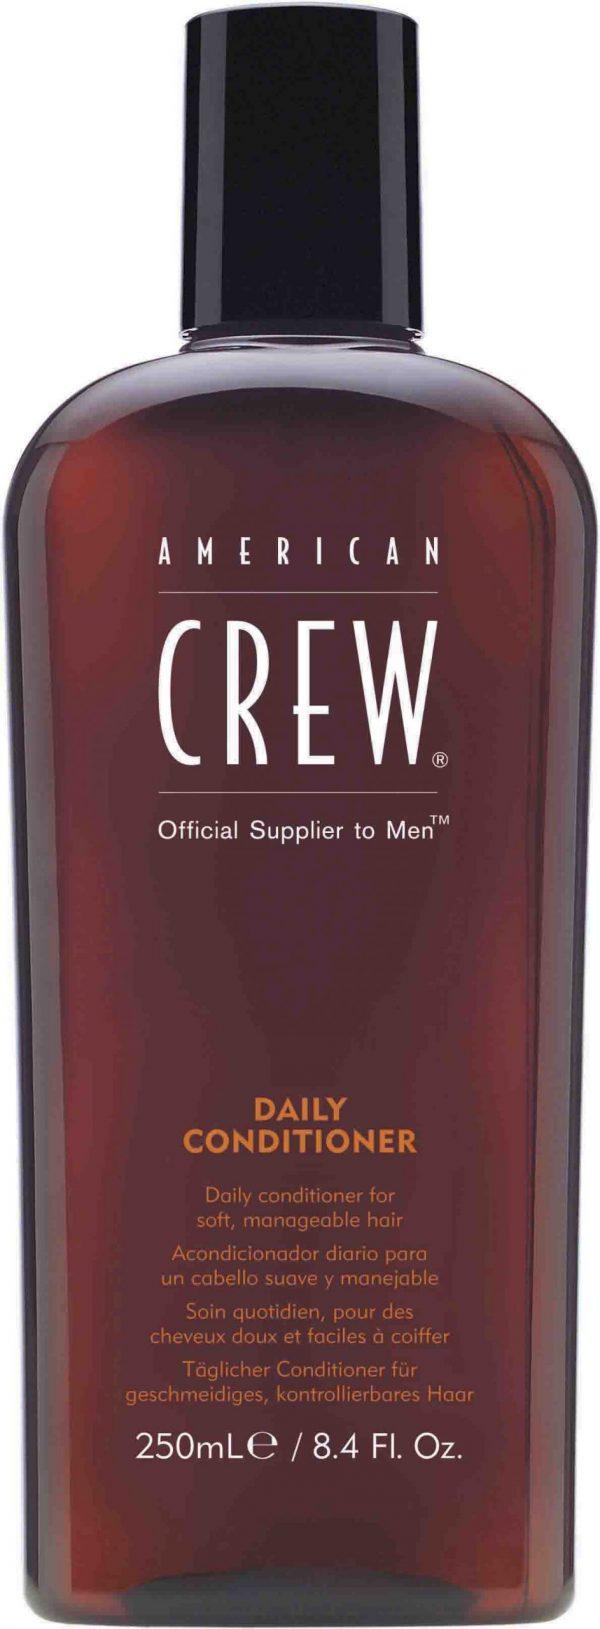 American Crew - Daily Conditioner 250 ml.